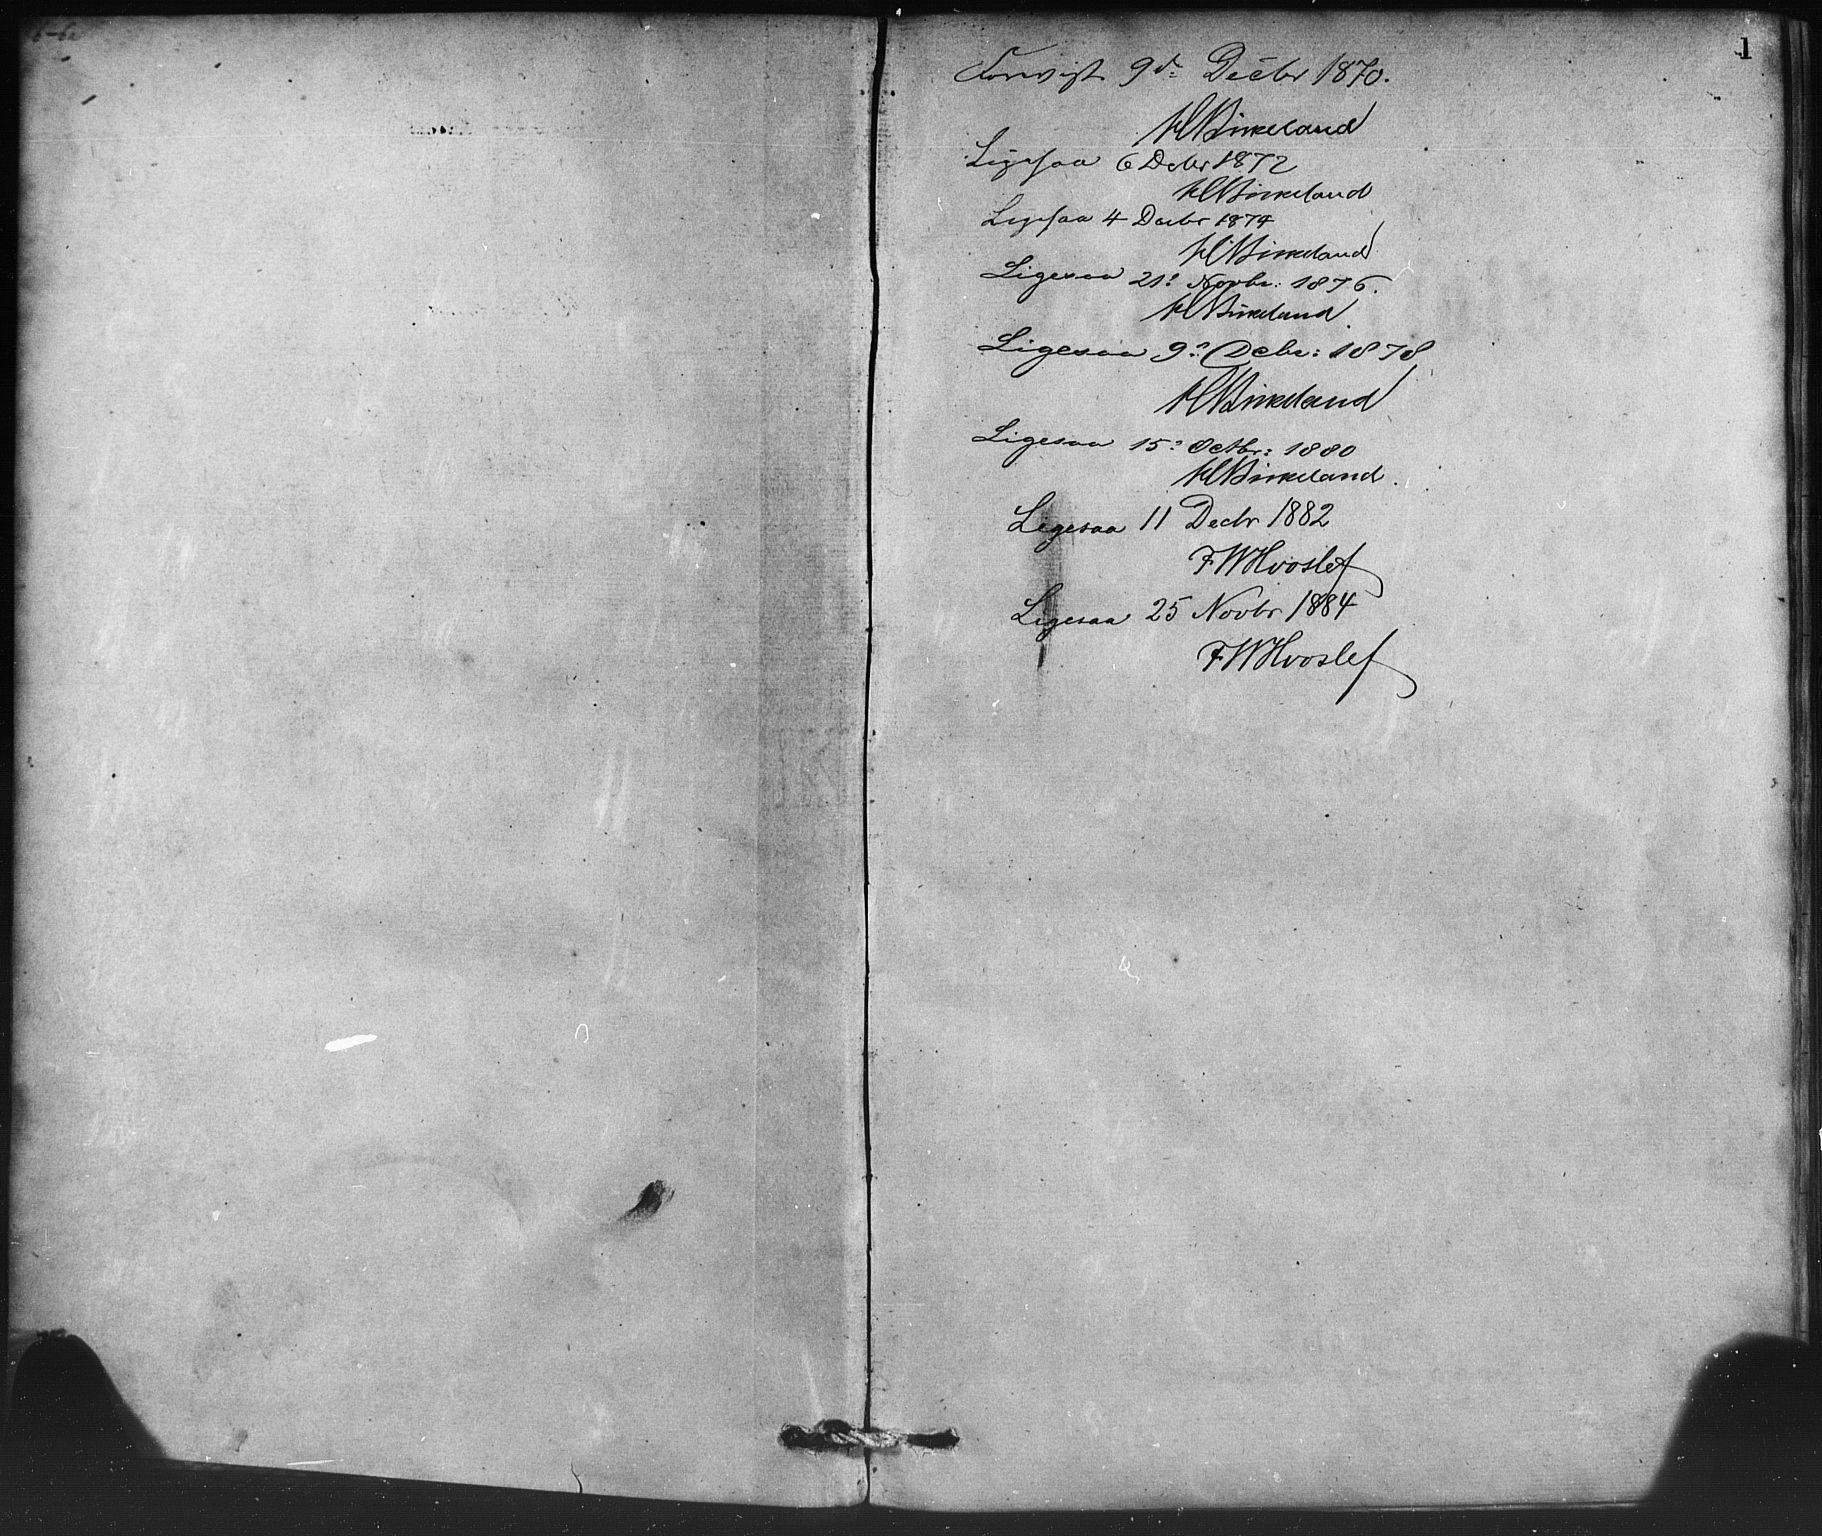 SAB, Nykirken Sokneprestembete, H/Haa: Ministerialbok nr. B 3, 1870-1884, s. 1